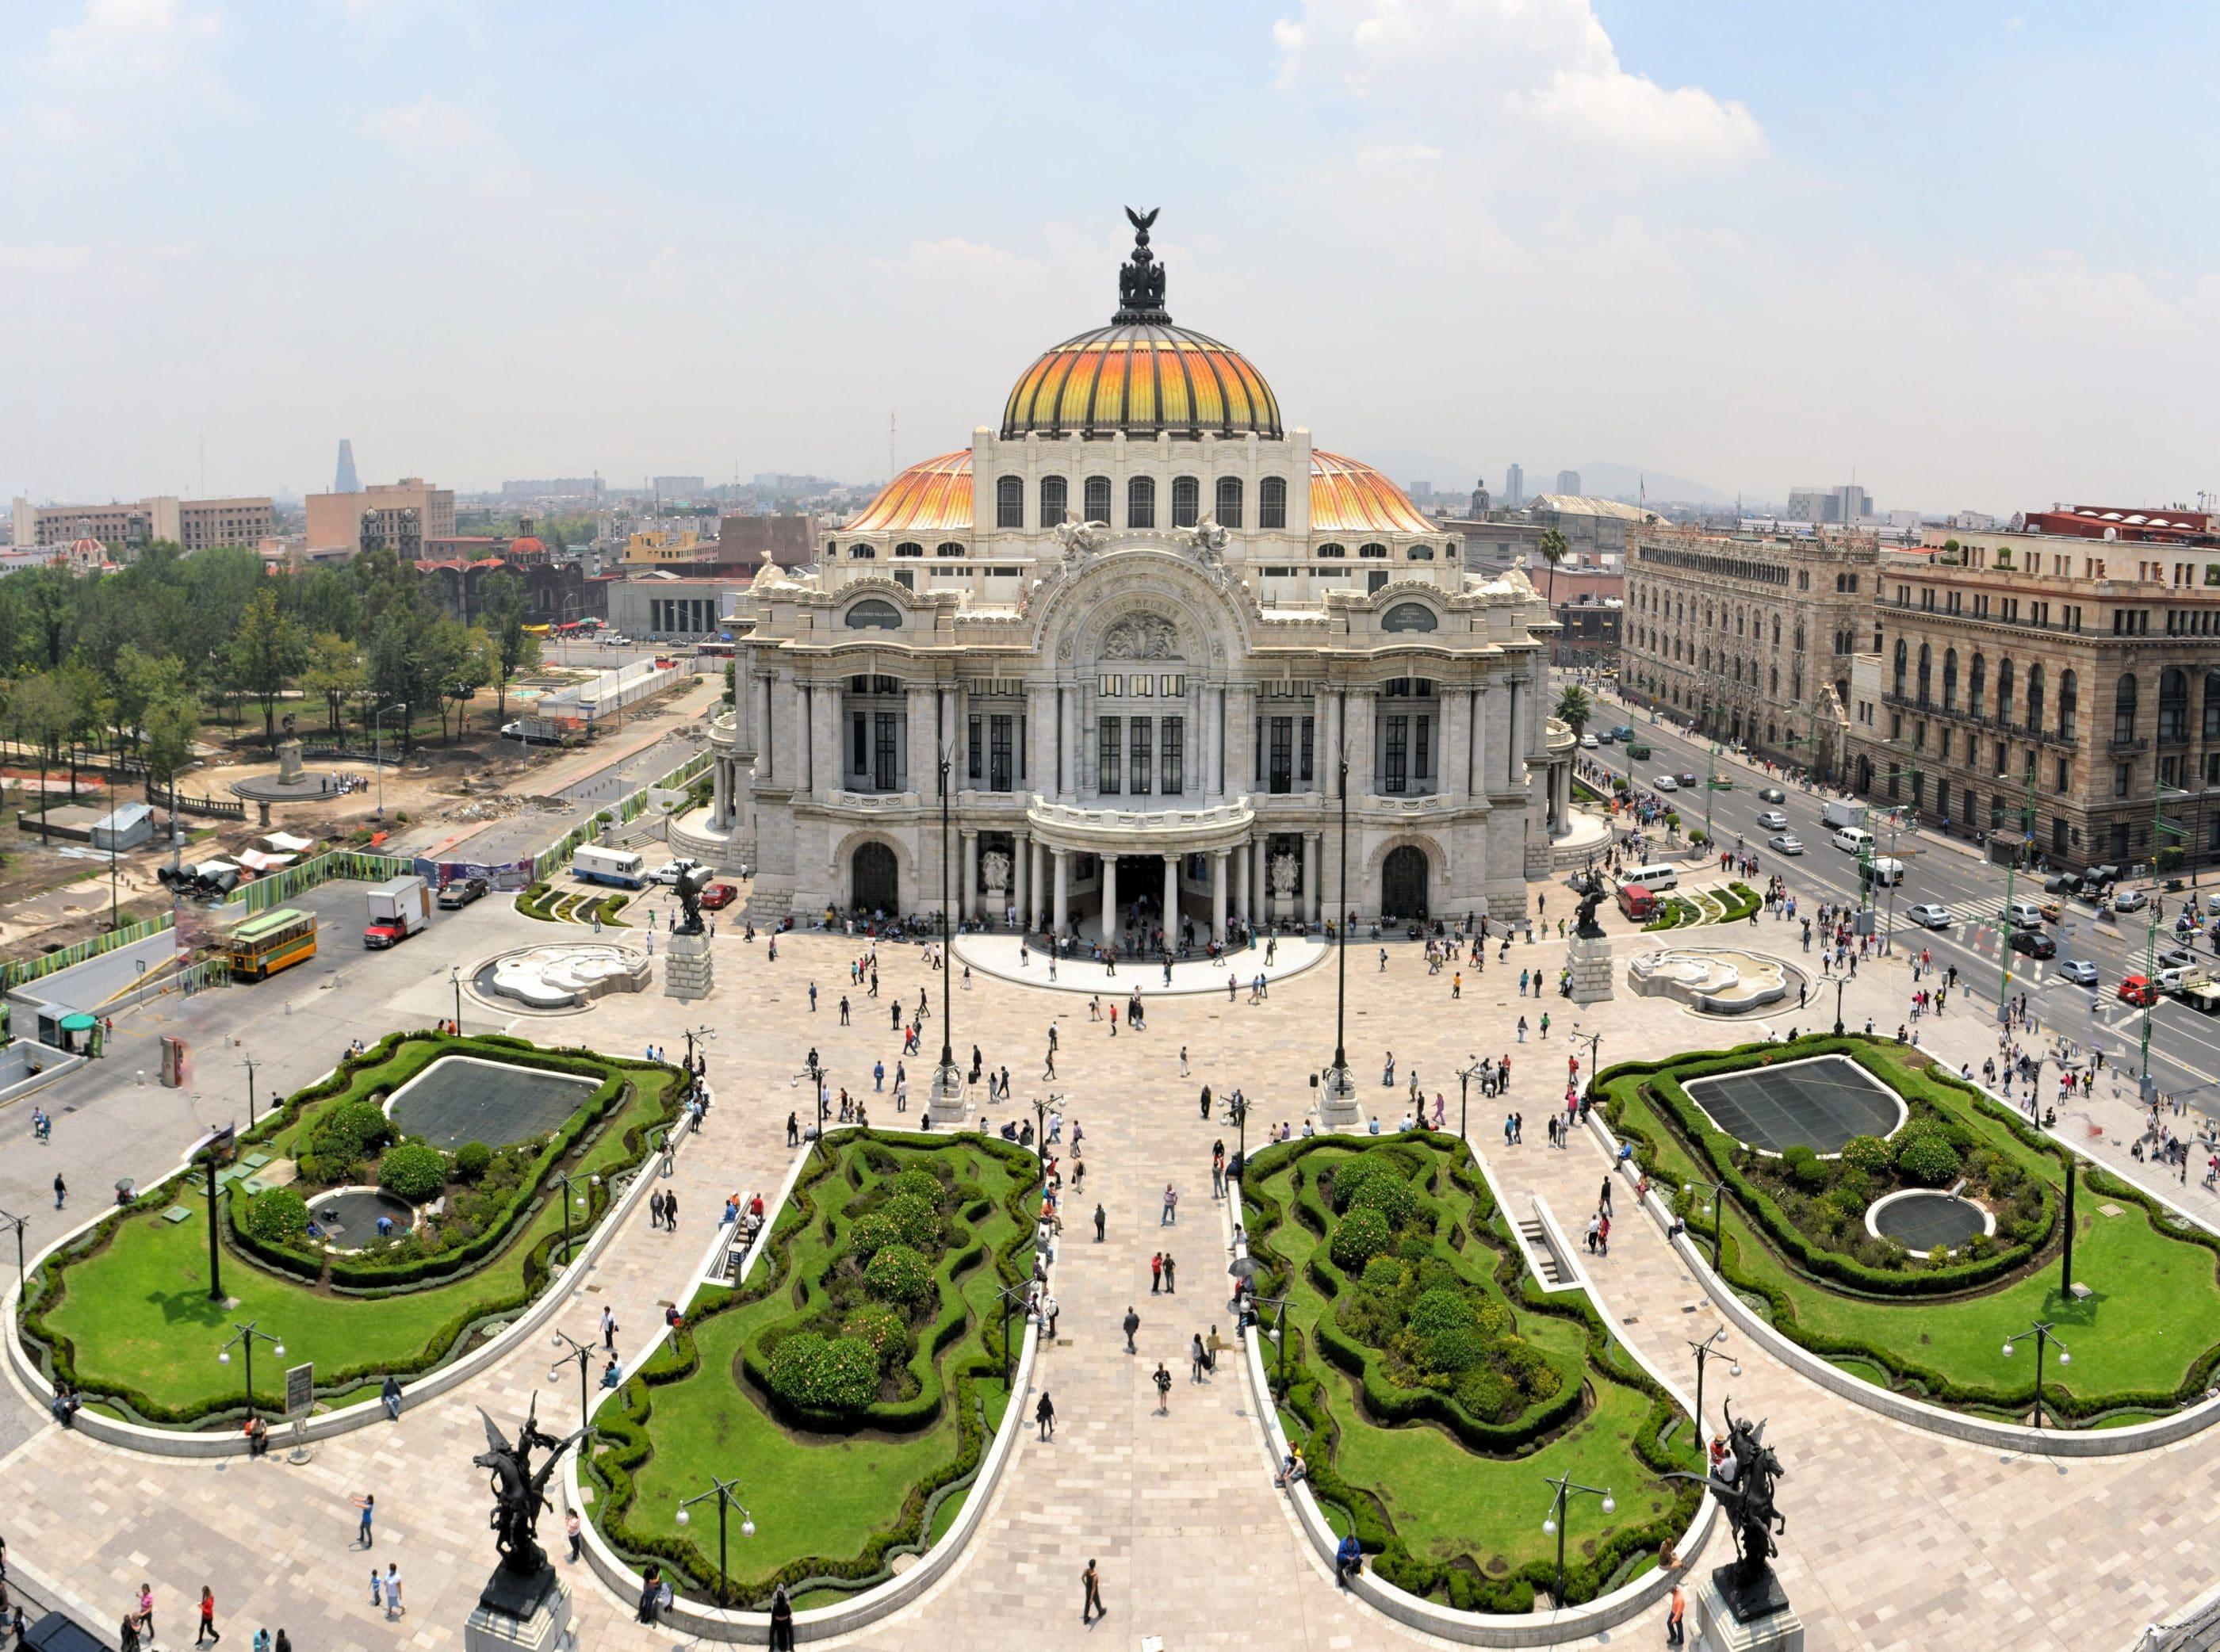 Aerial view of the Palacio de Bellas Artes in Mexico City with people walking around its exterior.